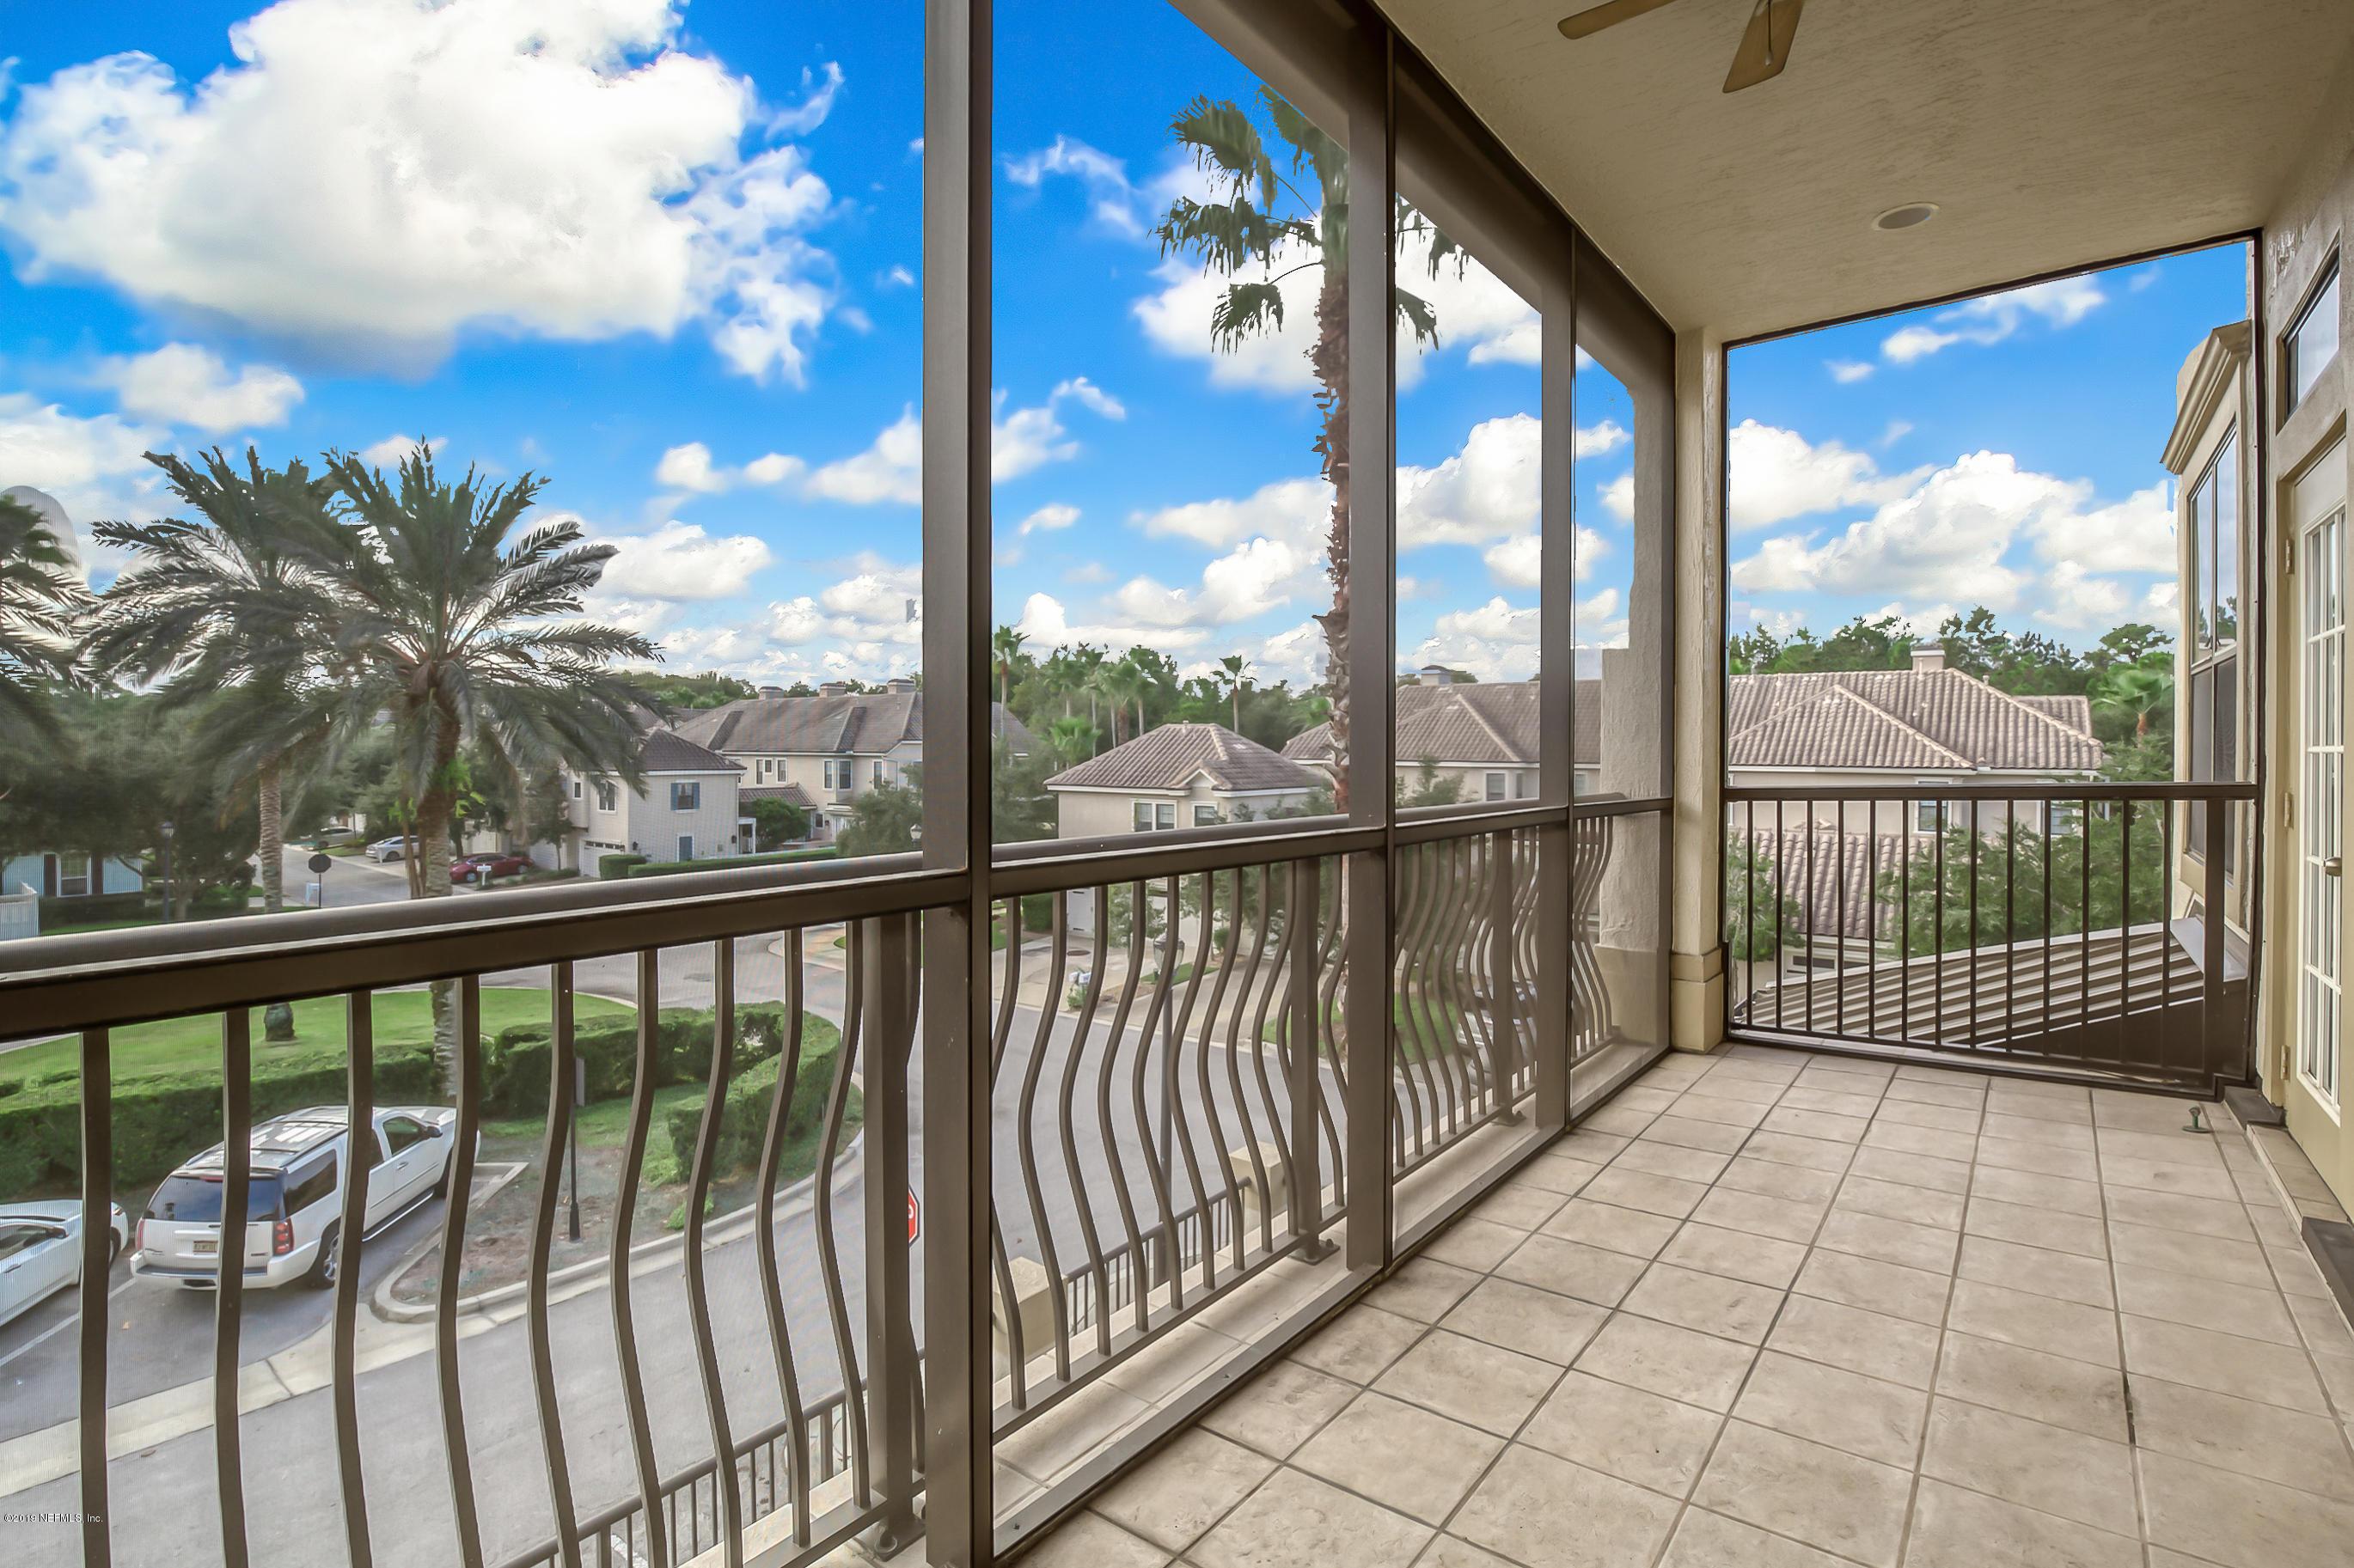 701 MARKET, ST AUGUSTINE, FLORIDA 32095, 2 Bedrooms Bedrooms, ,2 BathroomsBathrooms,Condo,For sale,MARKET,1017042